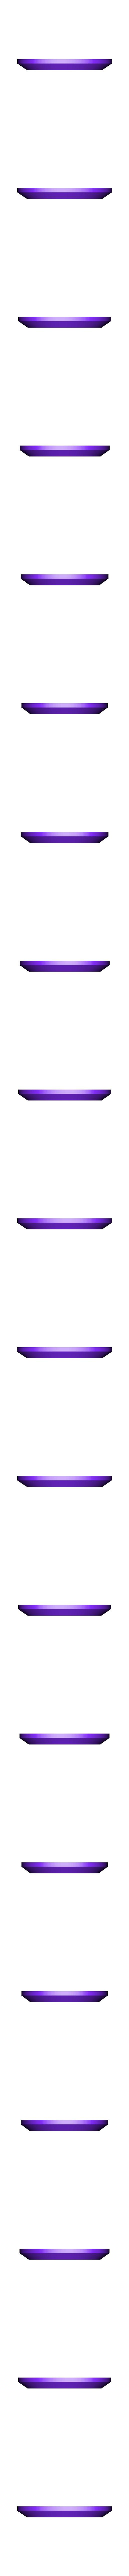 gut.obj Download free OBJ file Among Us (easy print)(crew/body/ghost/impostor) • 3D printable template, devanborkhatria